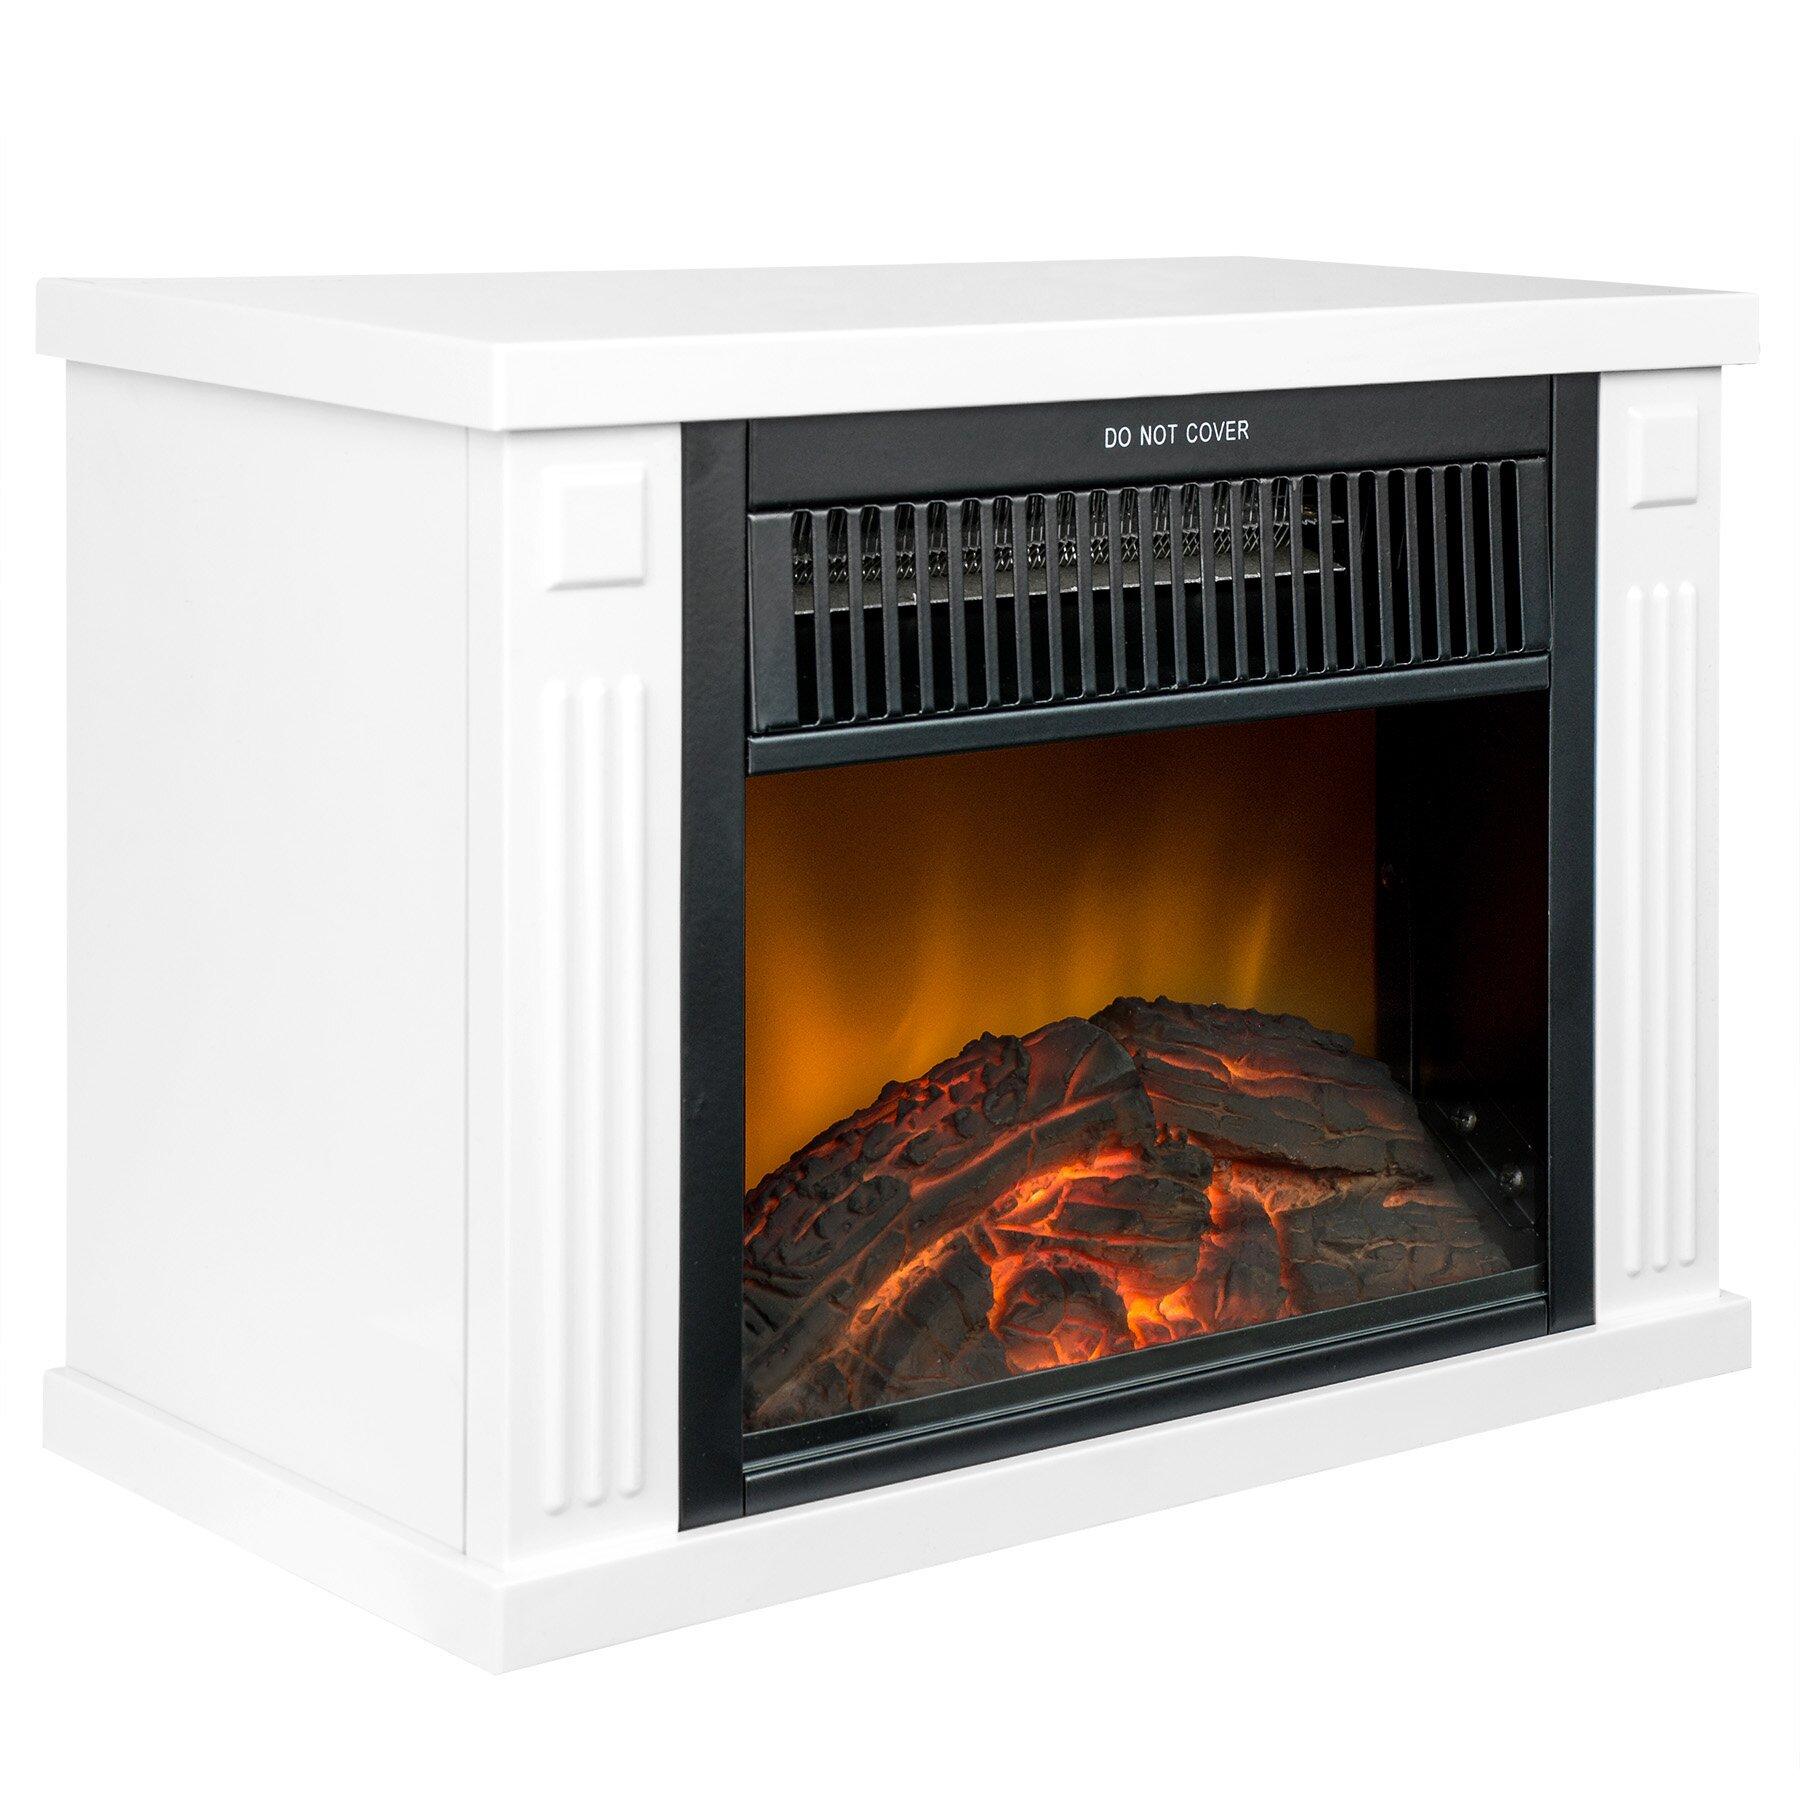 akdy 1 000 watt portable electric compact heater reviews